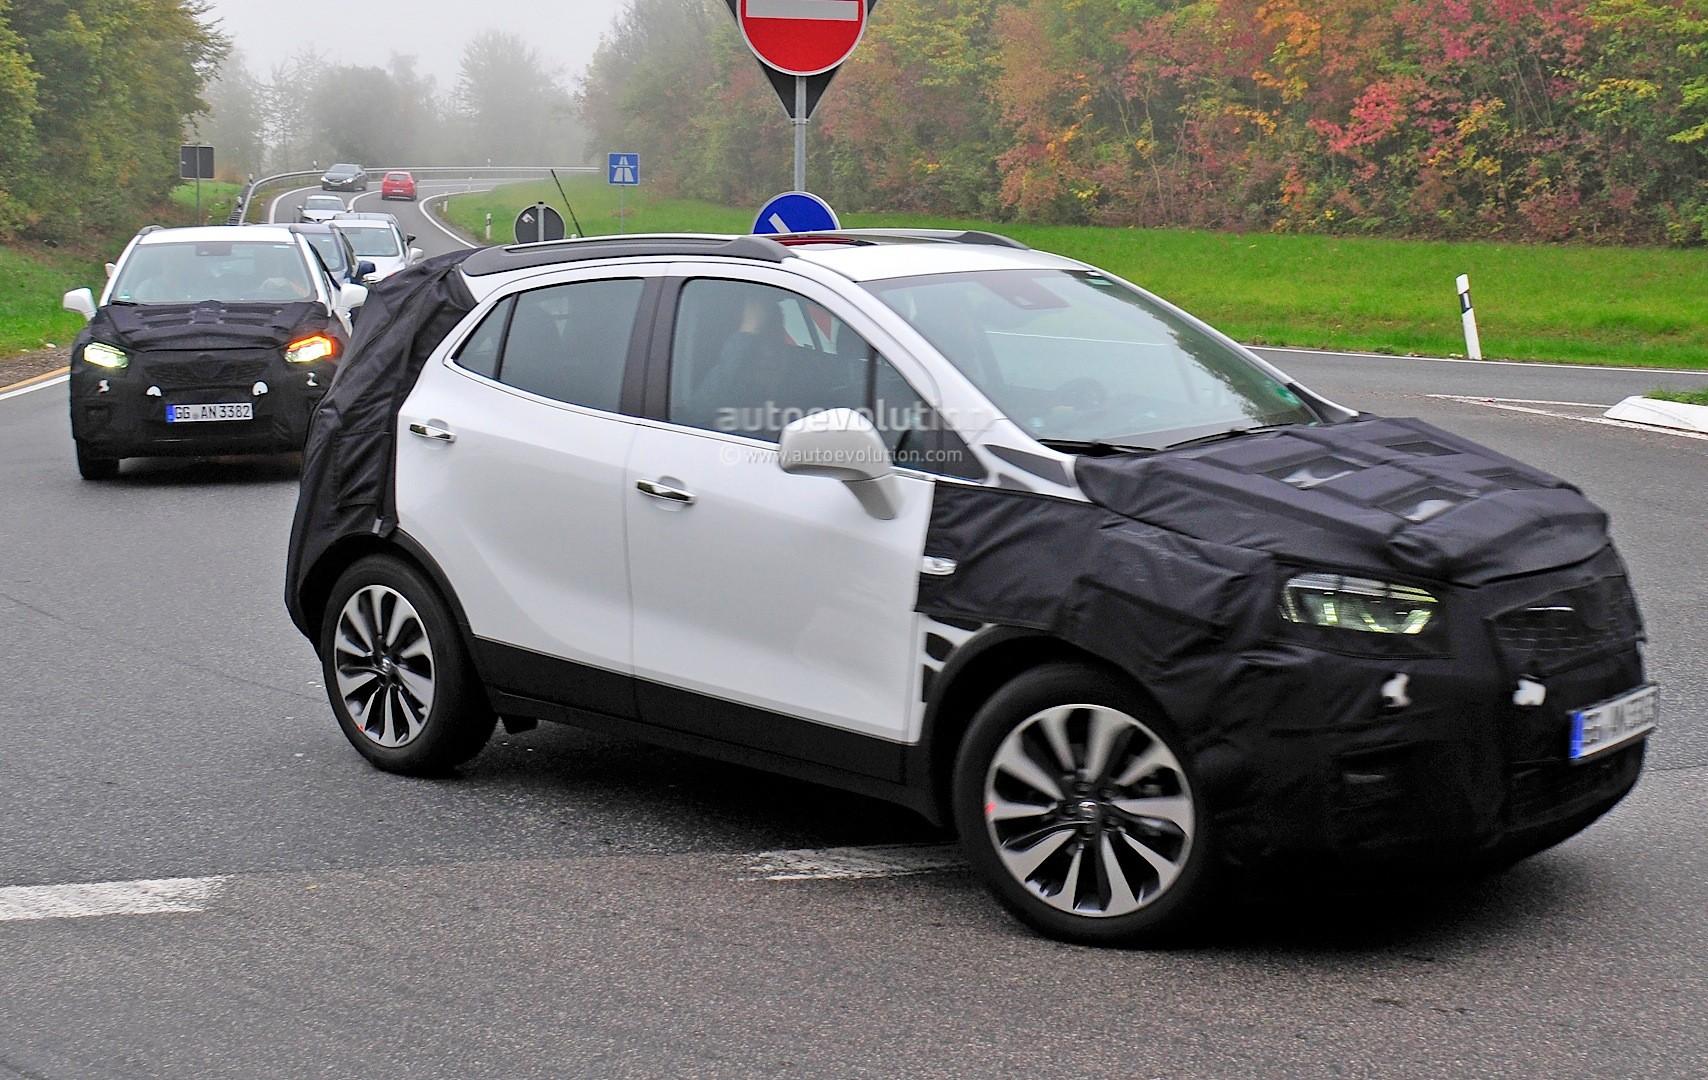 Opel Mokka Wiring Diagrams Electrical Diagram Calibra Spyshots 2016 Facelift Getting Led Headlights 2017 X